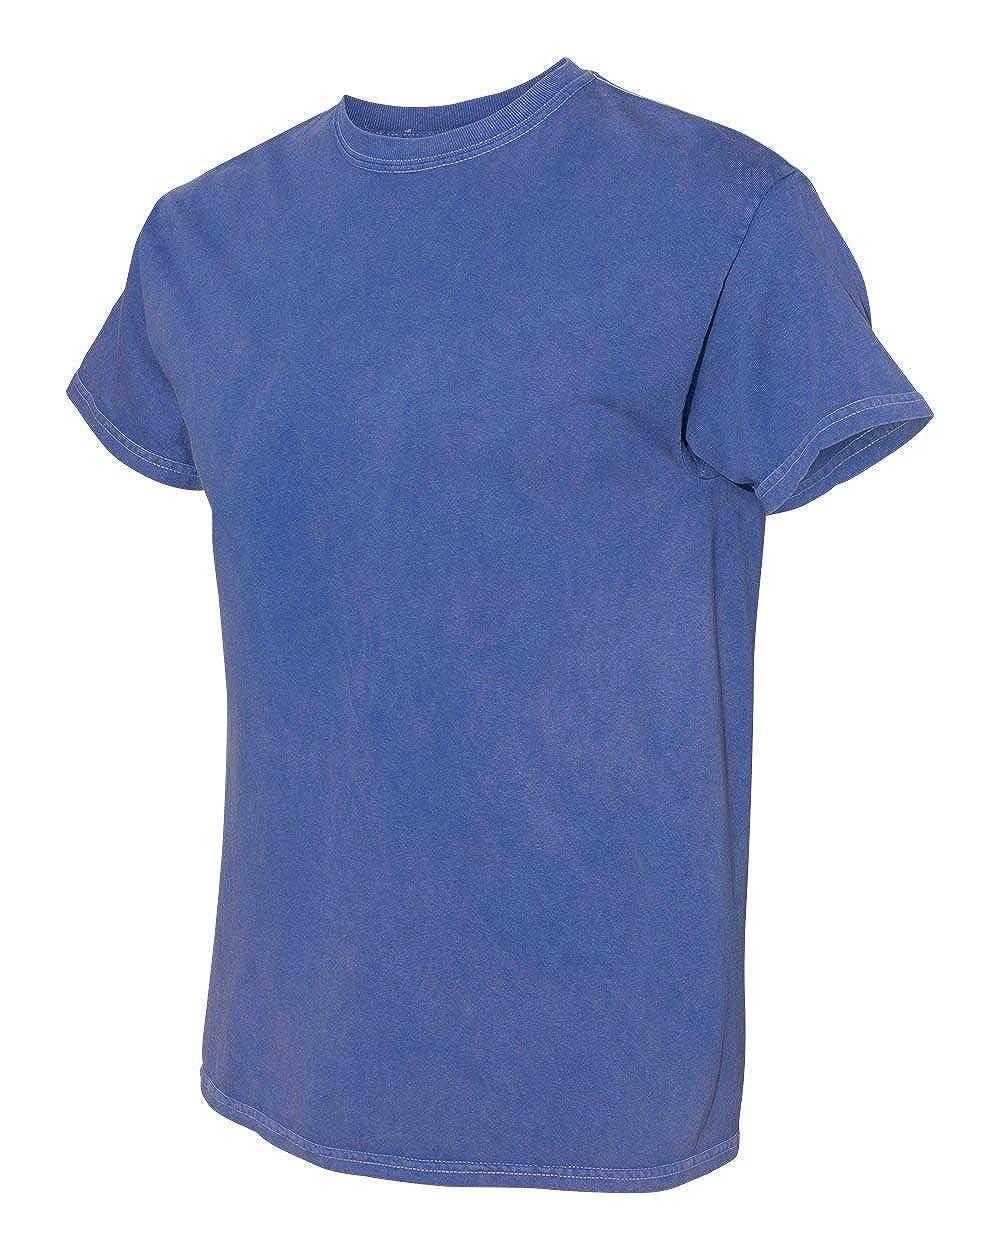 Moms Favorite Dyenomite Mineral Wash T-Shirt 200MW